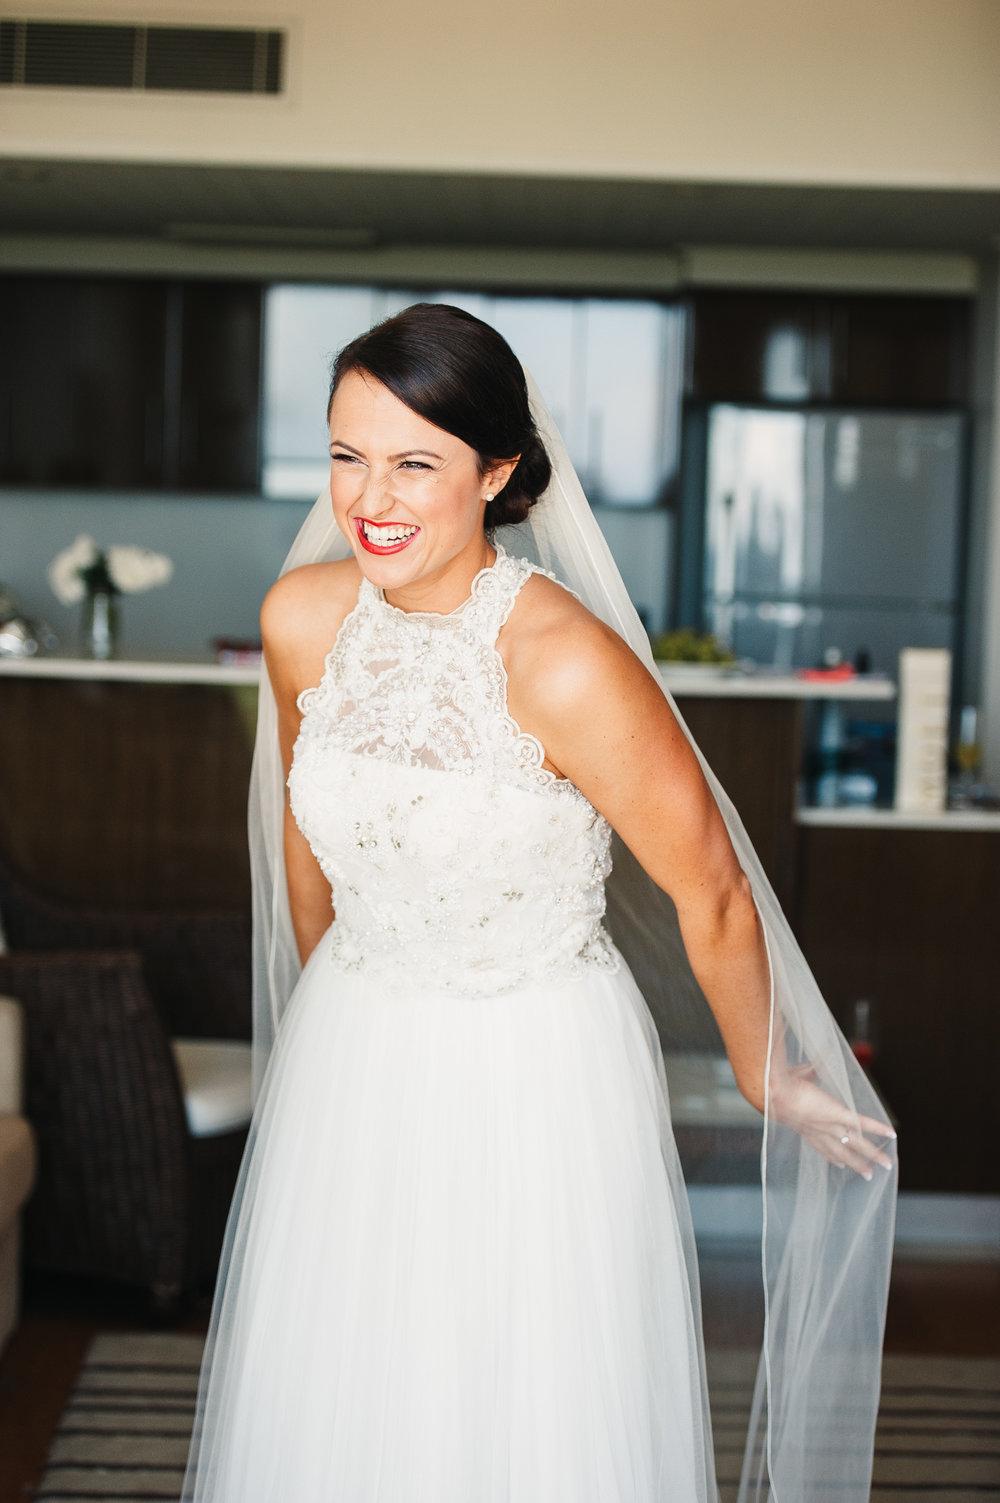 Osteria wedding_New Black Studios 18.jpg